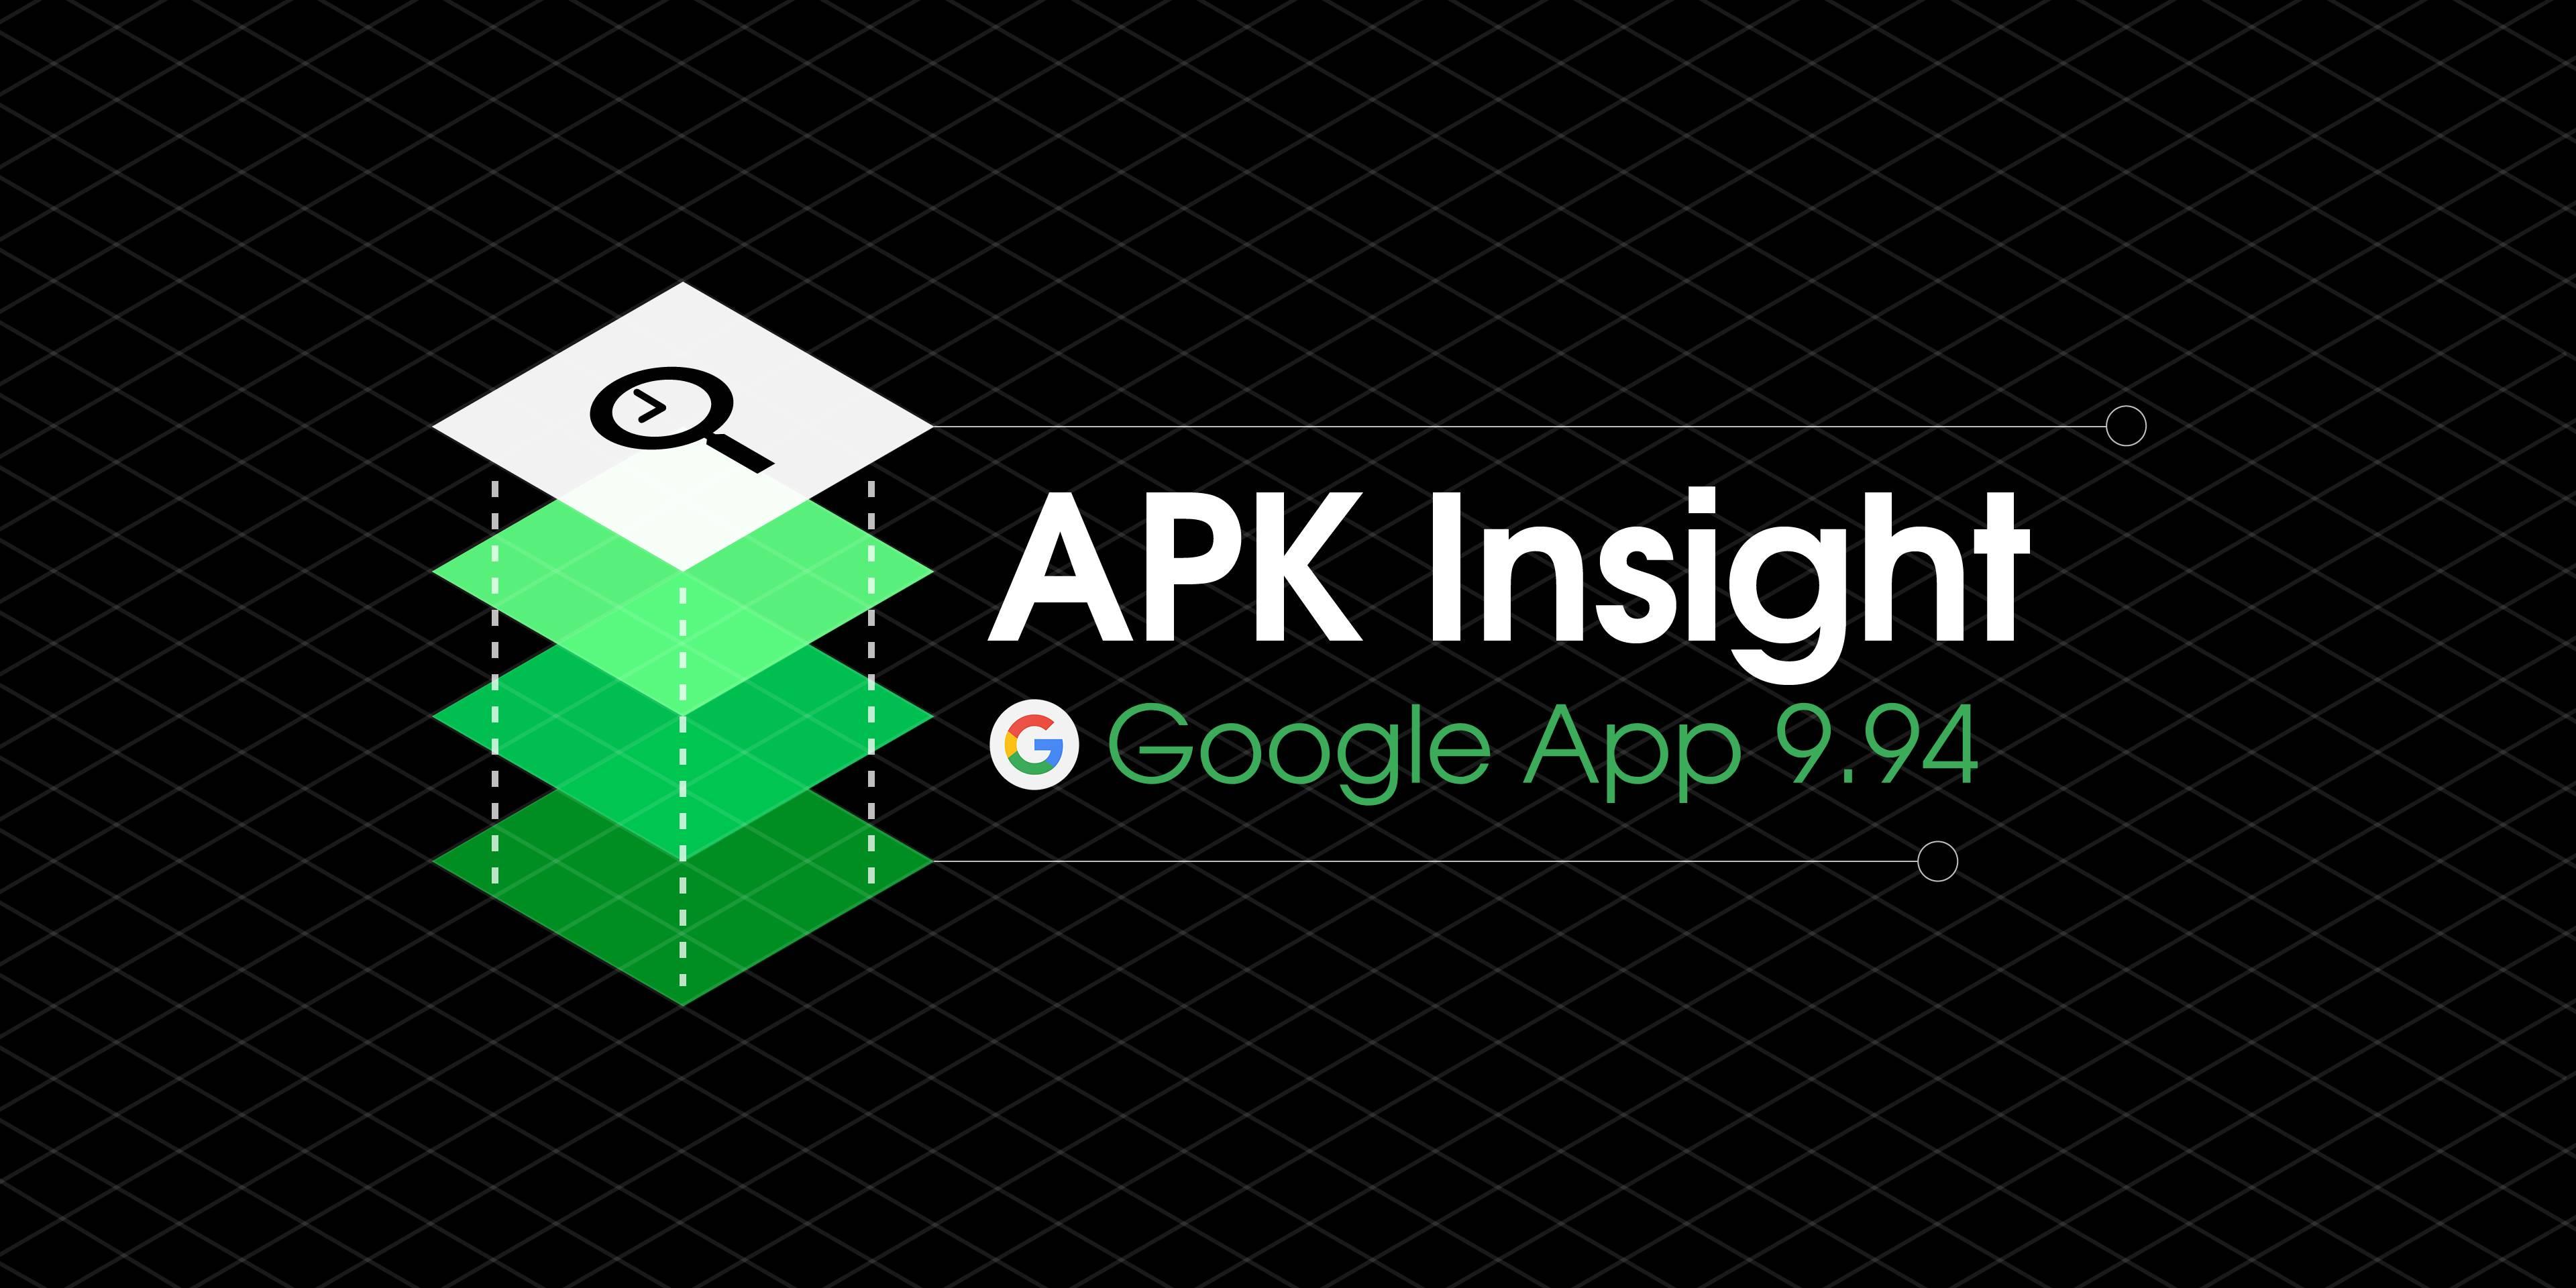 Google App 9.94 Details Face Match Privatsphäre & Kinderkonfiguration, föderiertes Lernen [APK Insight]